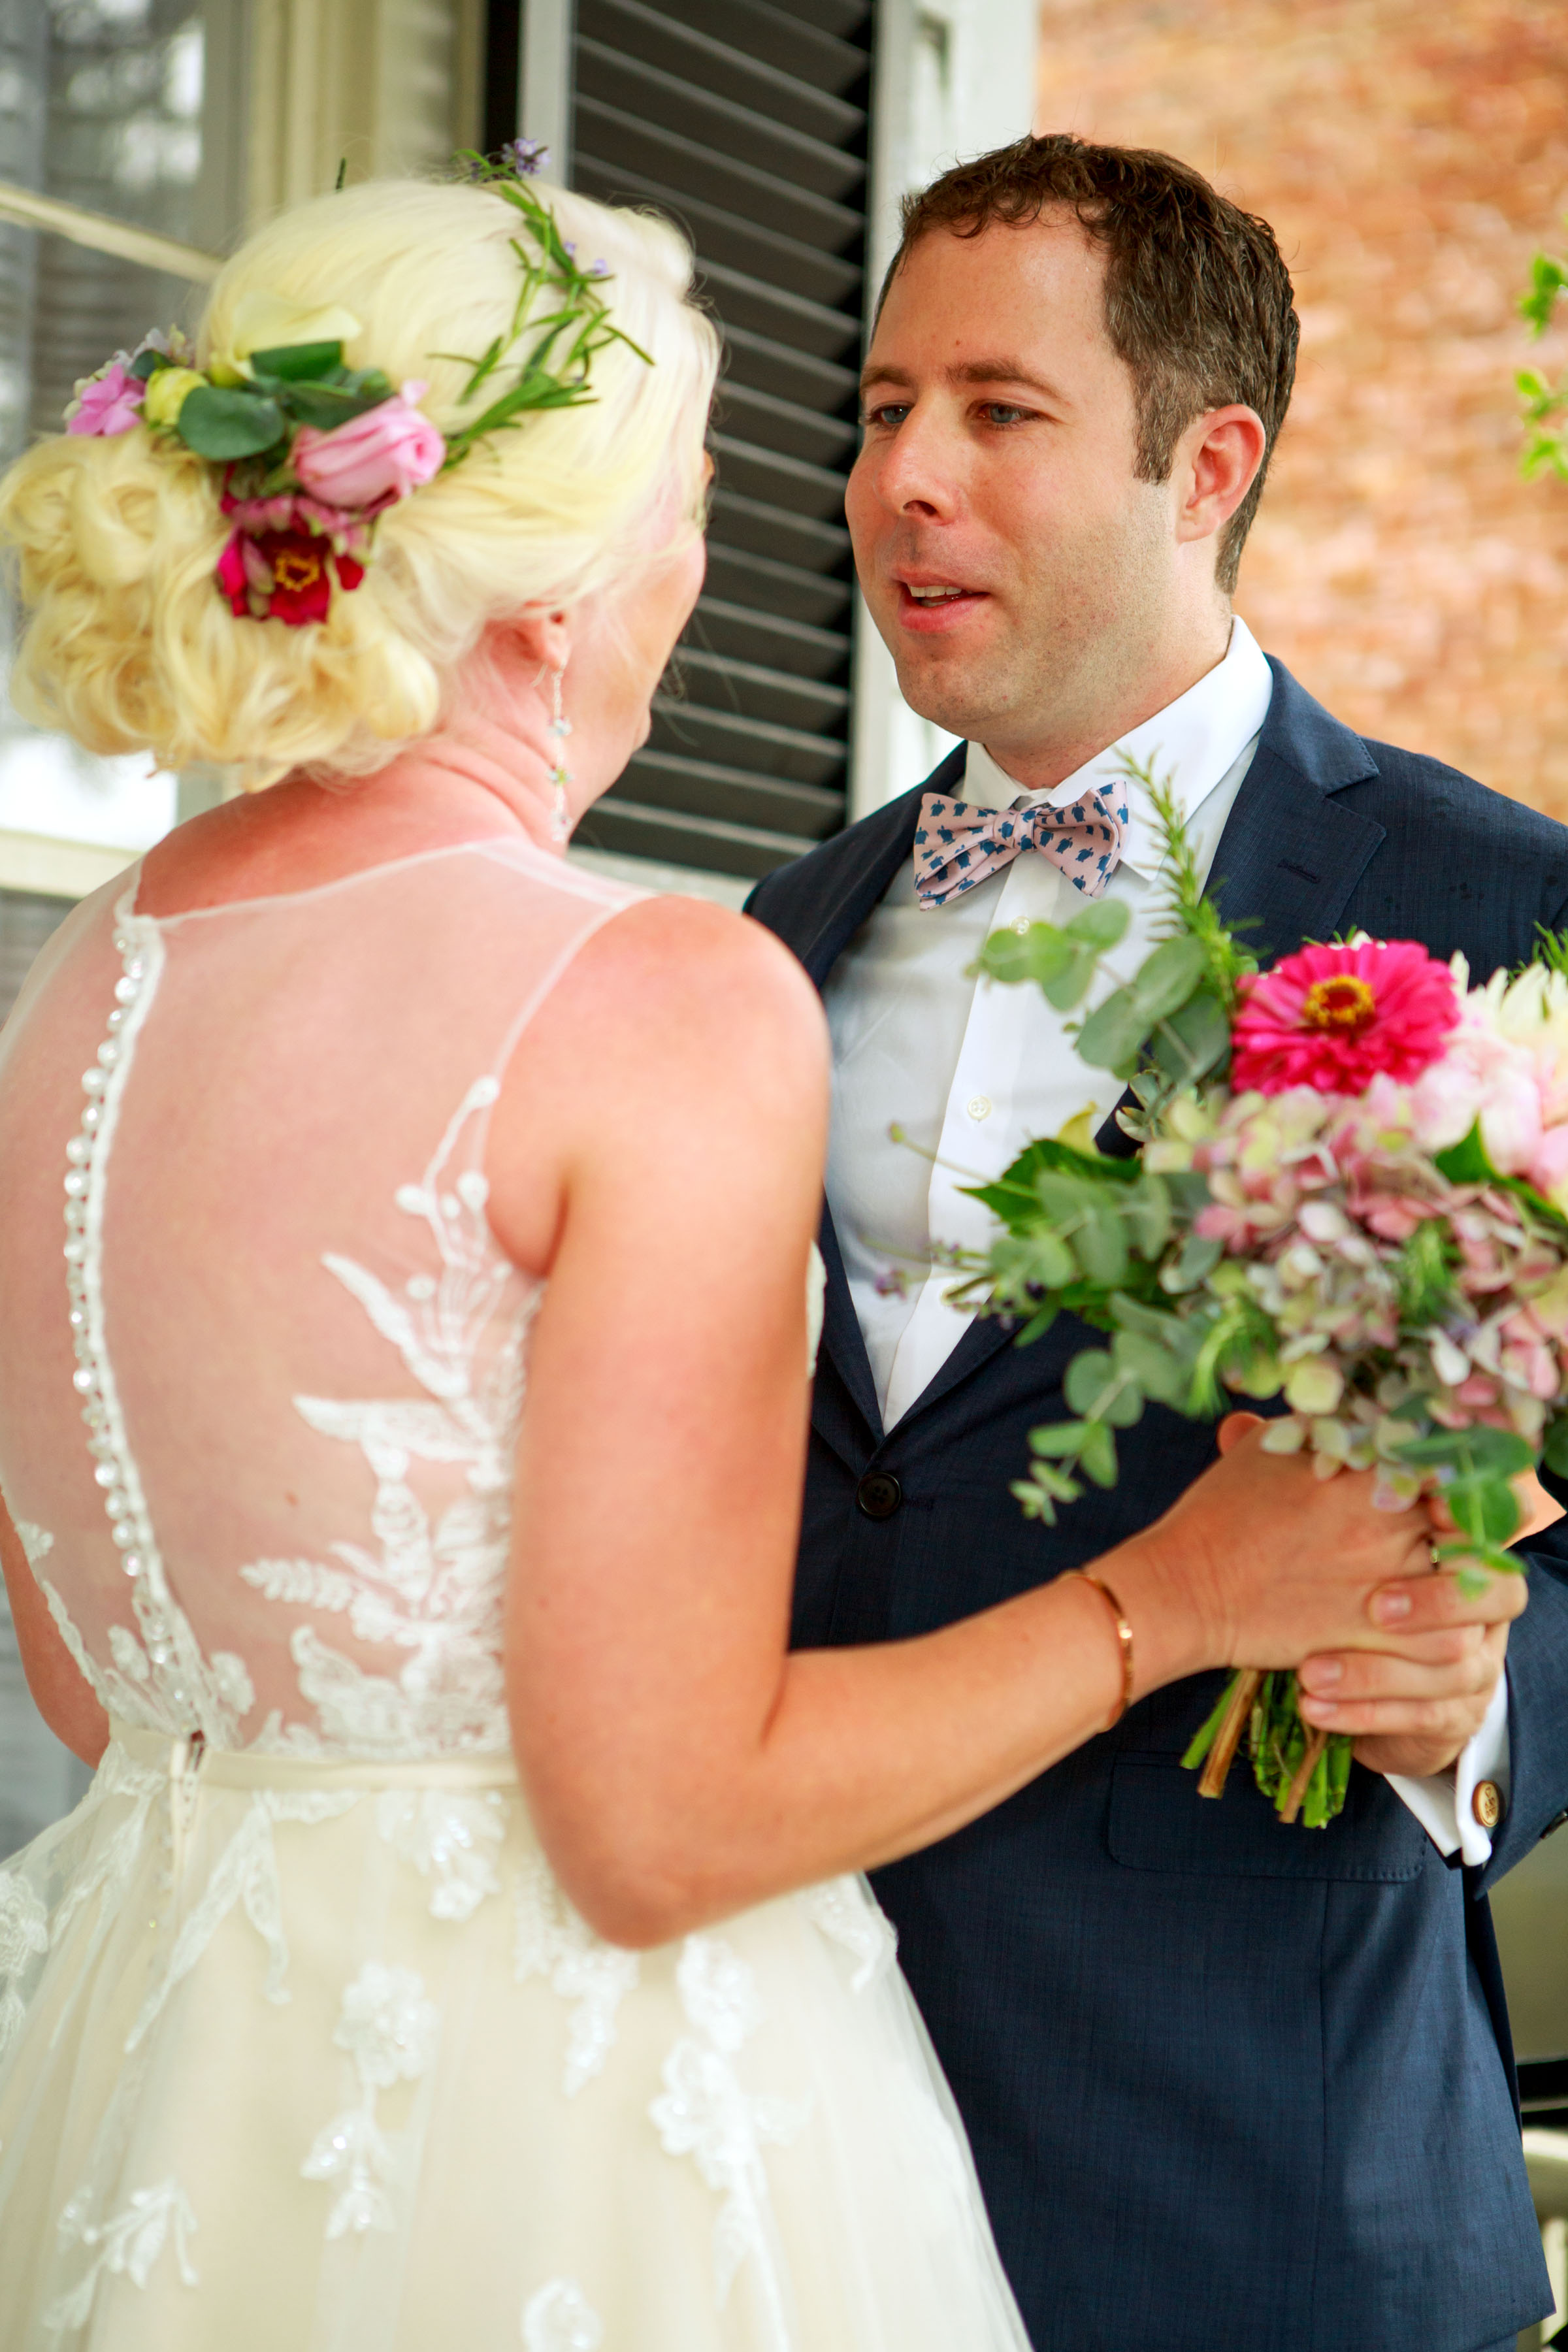 128-South-Wedding-Tiffany-Abruzzo-Photography-First-Look-9.jpg